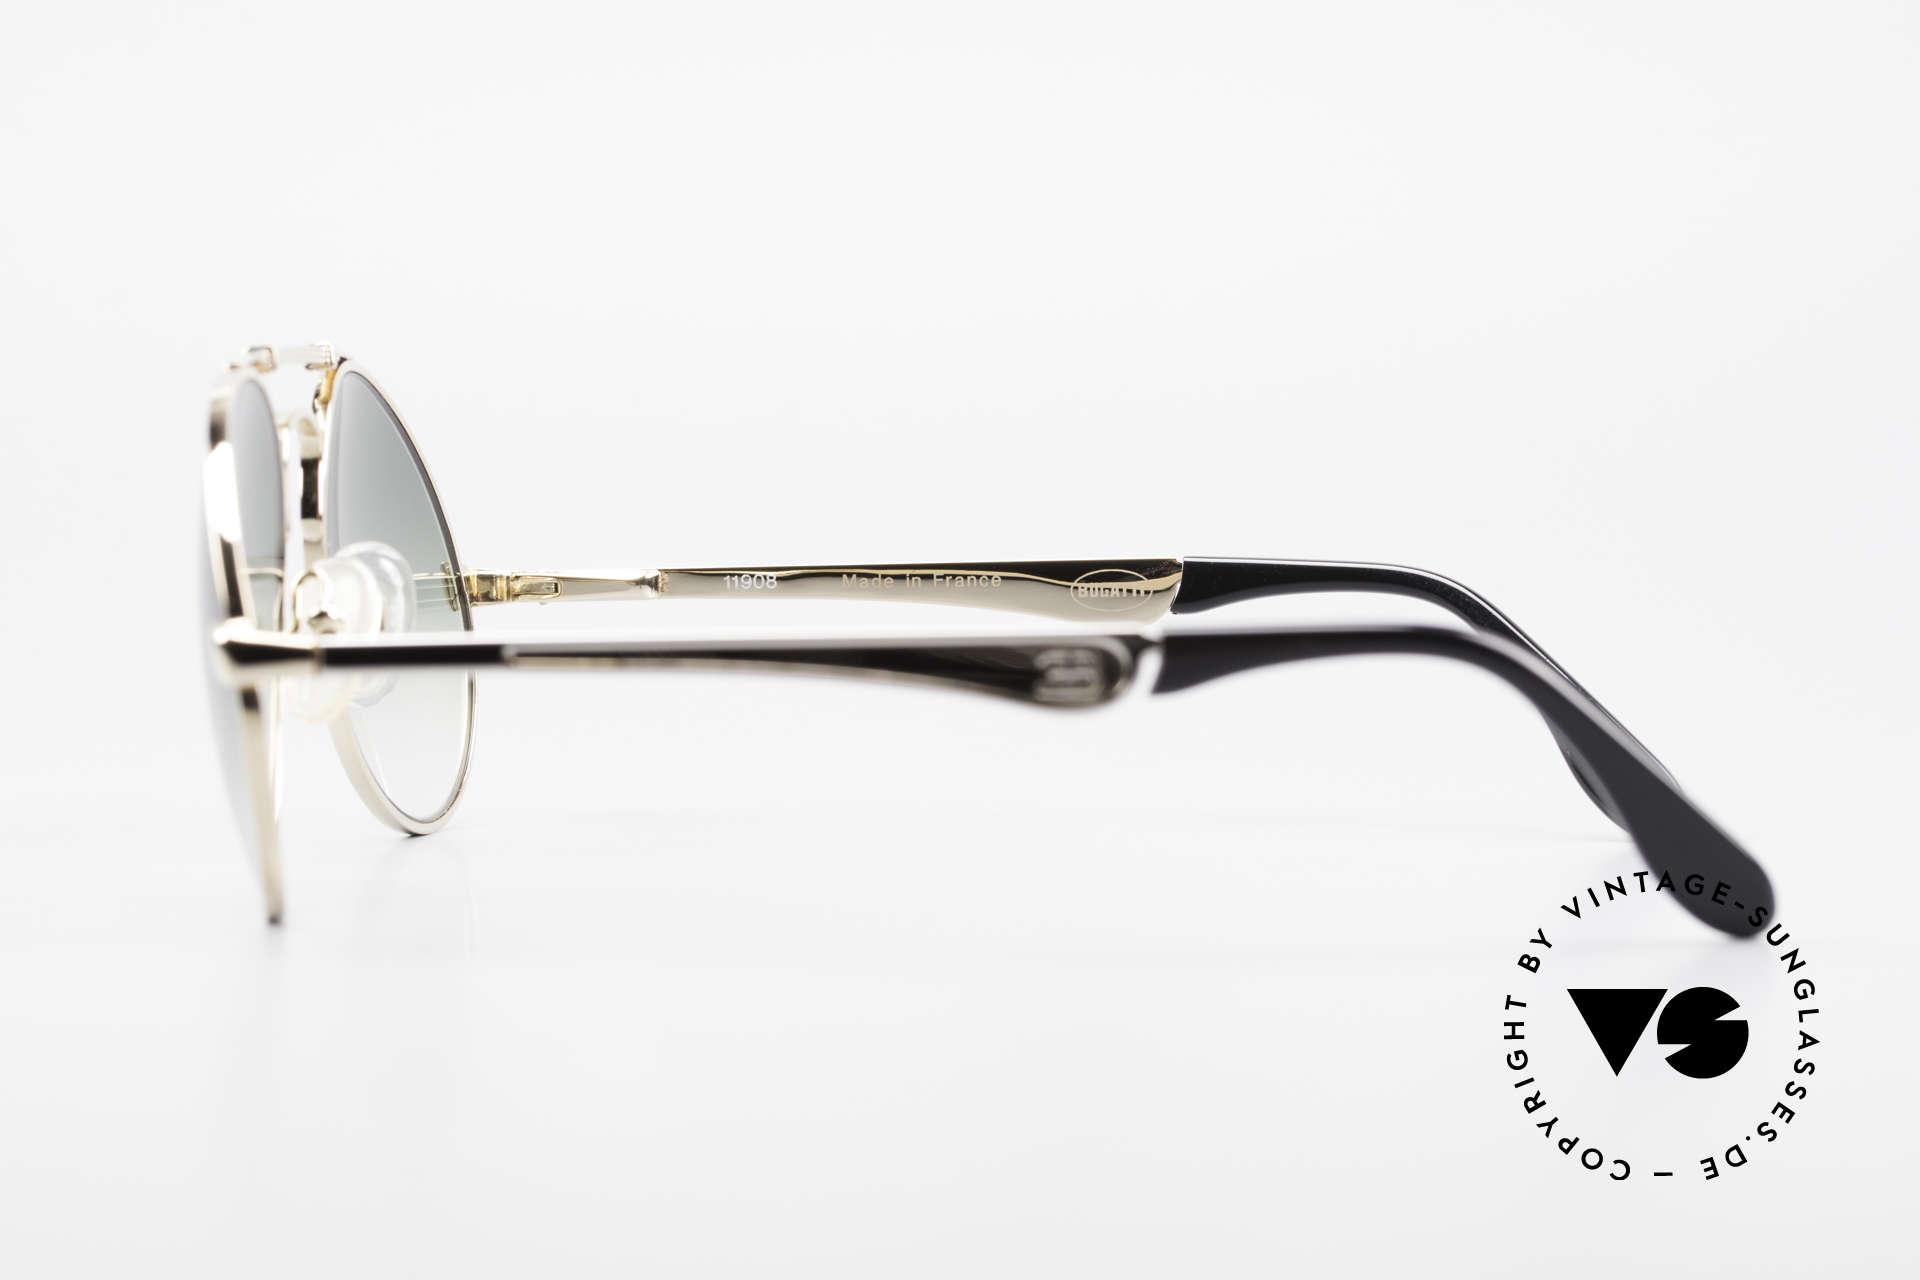 Bugatti 11908 Large 80's Luxury Sunglasses, Size: large, Made for Men